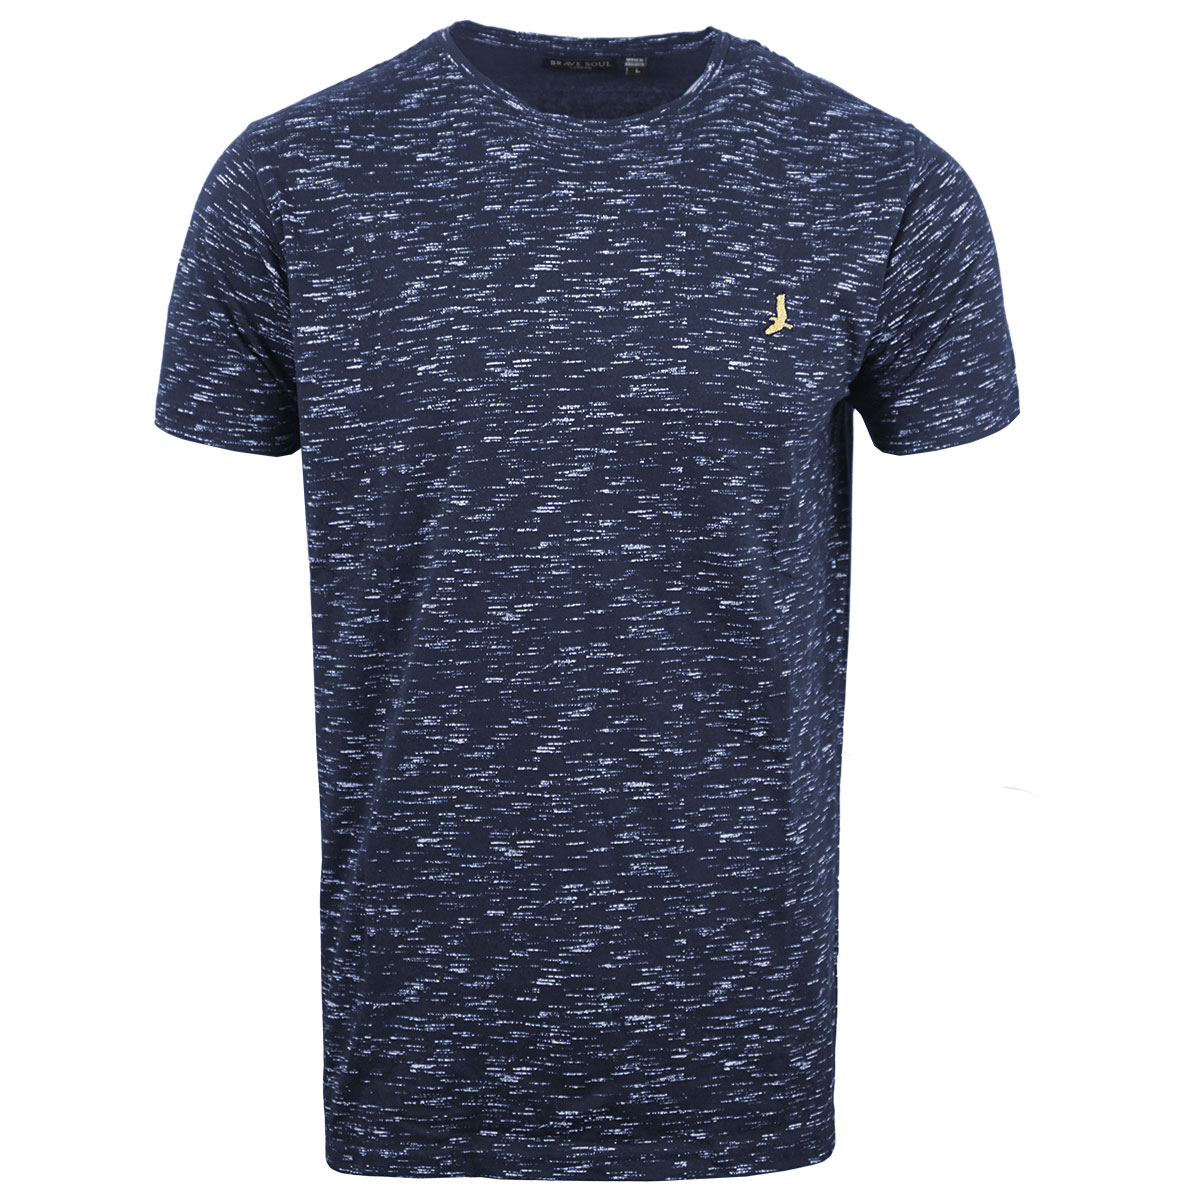 Brave-Soul-Mens-T-Shirt-Slub-Effect-Pattern-Design-Crew-Neck-Nigel thumbnail 2